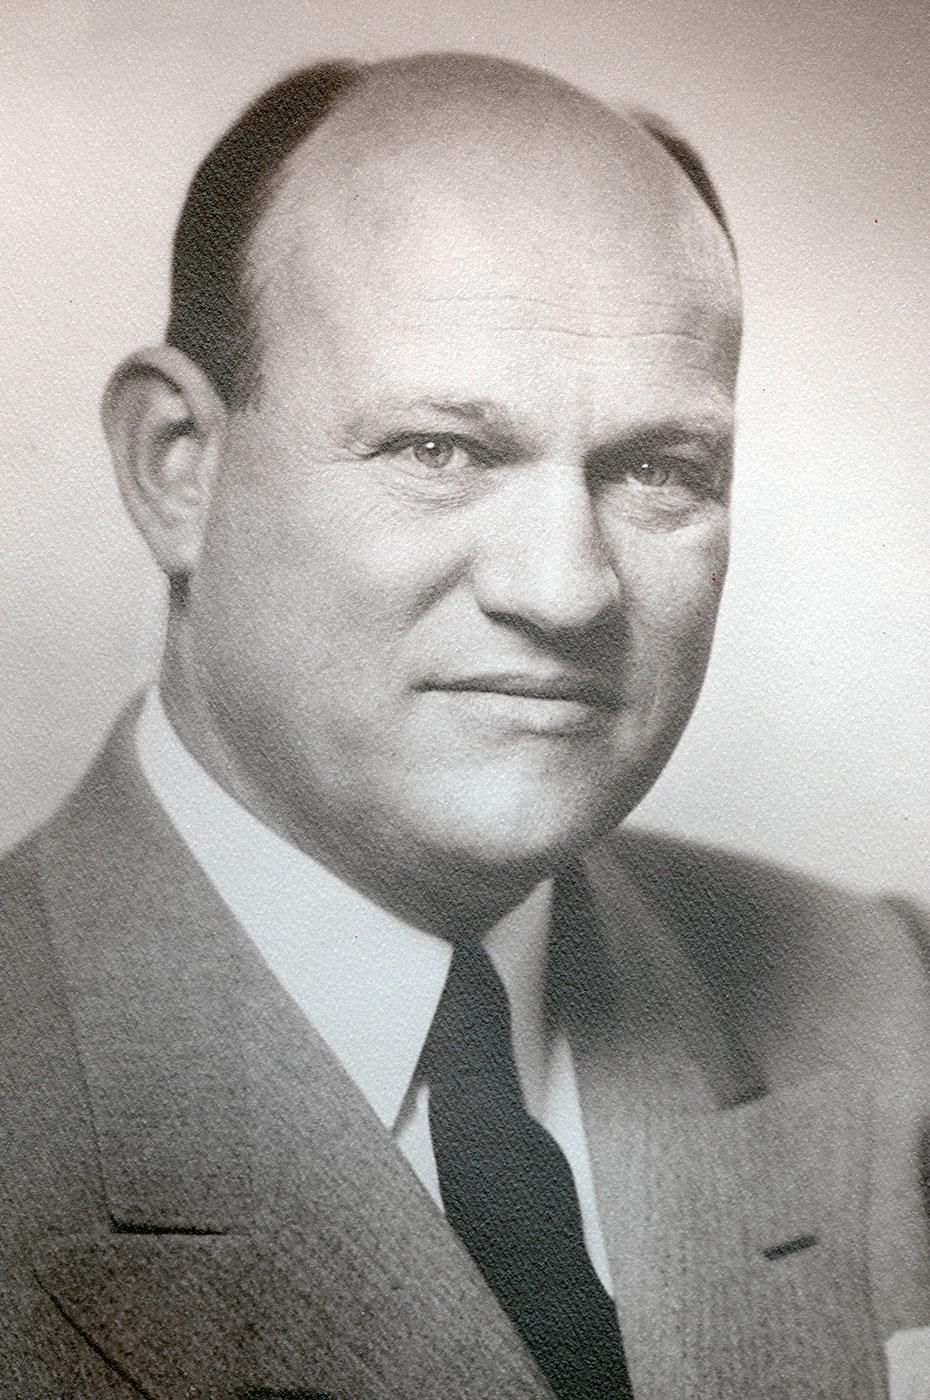 Sidney Goldin